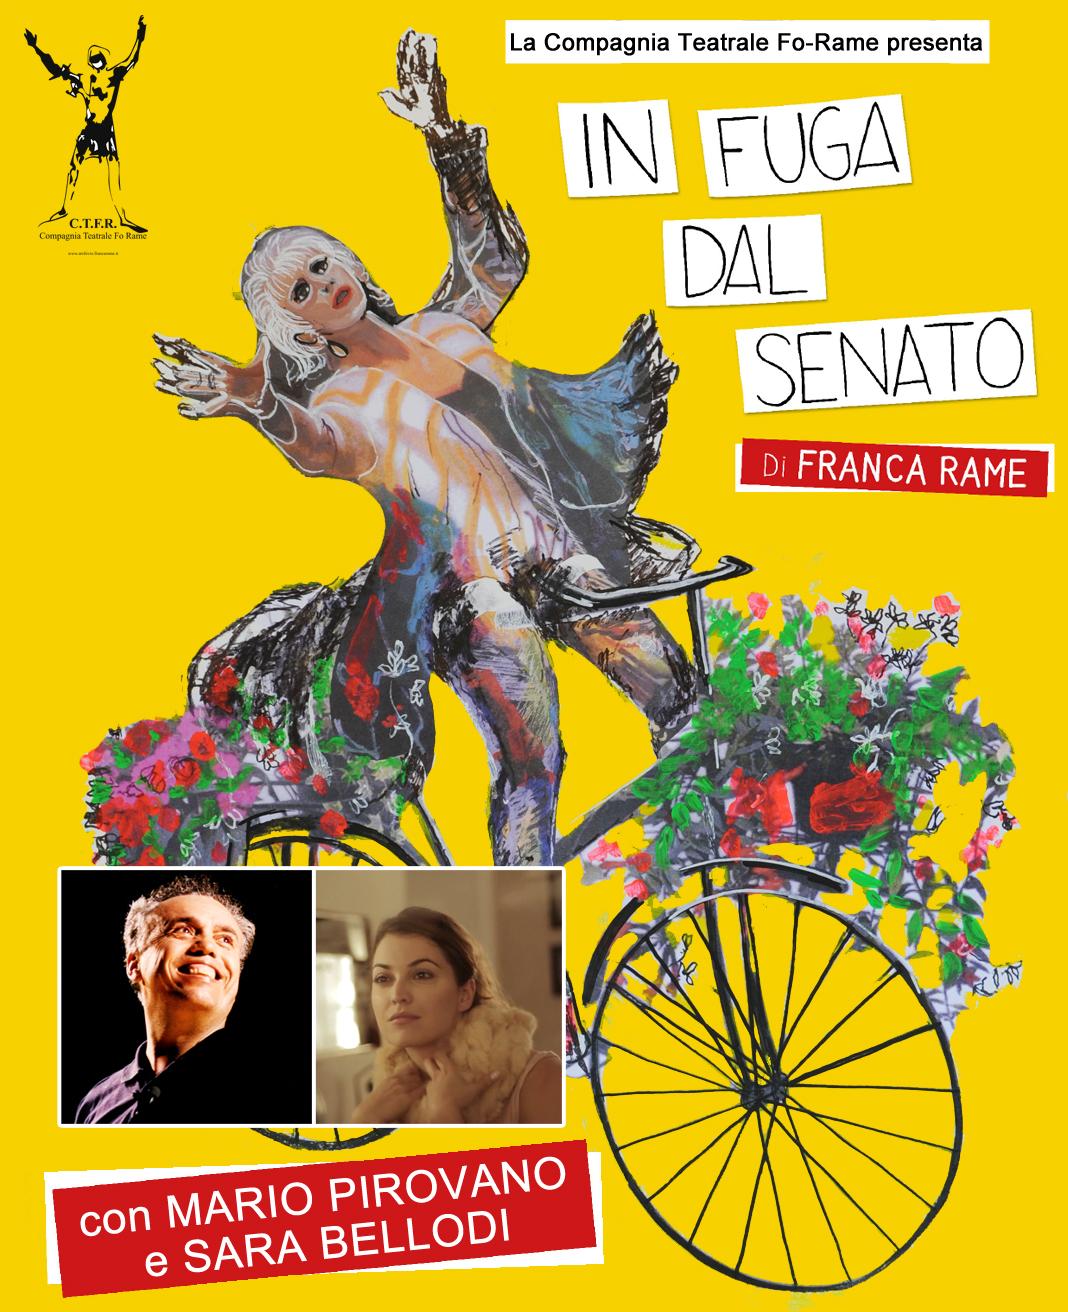 Mario Pirovano In Fuga dal Senato Dario Fo Franca Rame